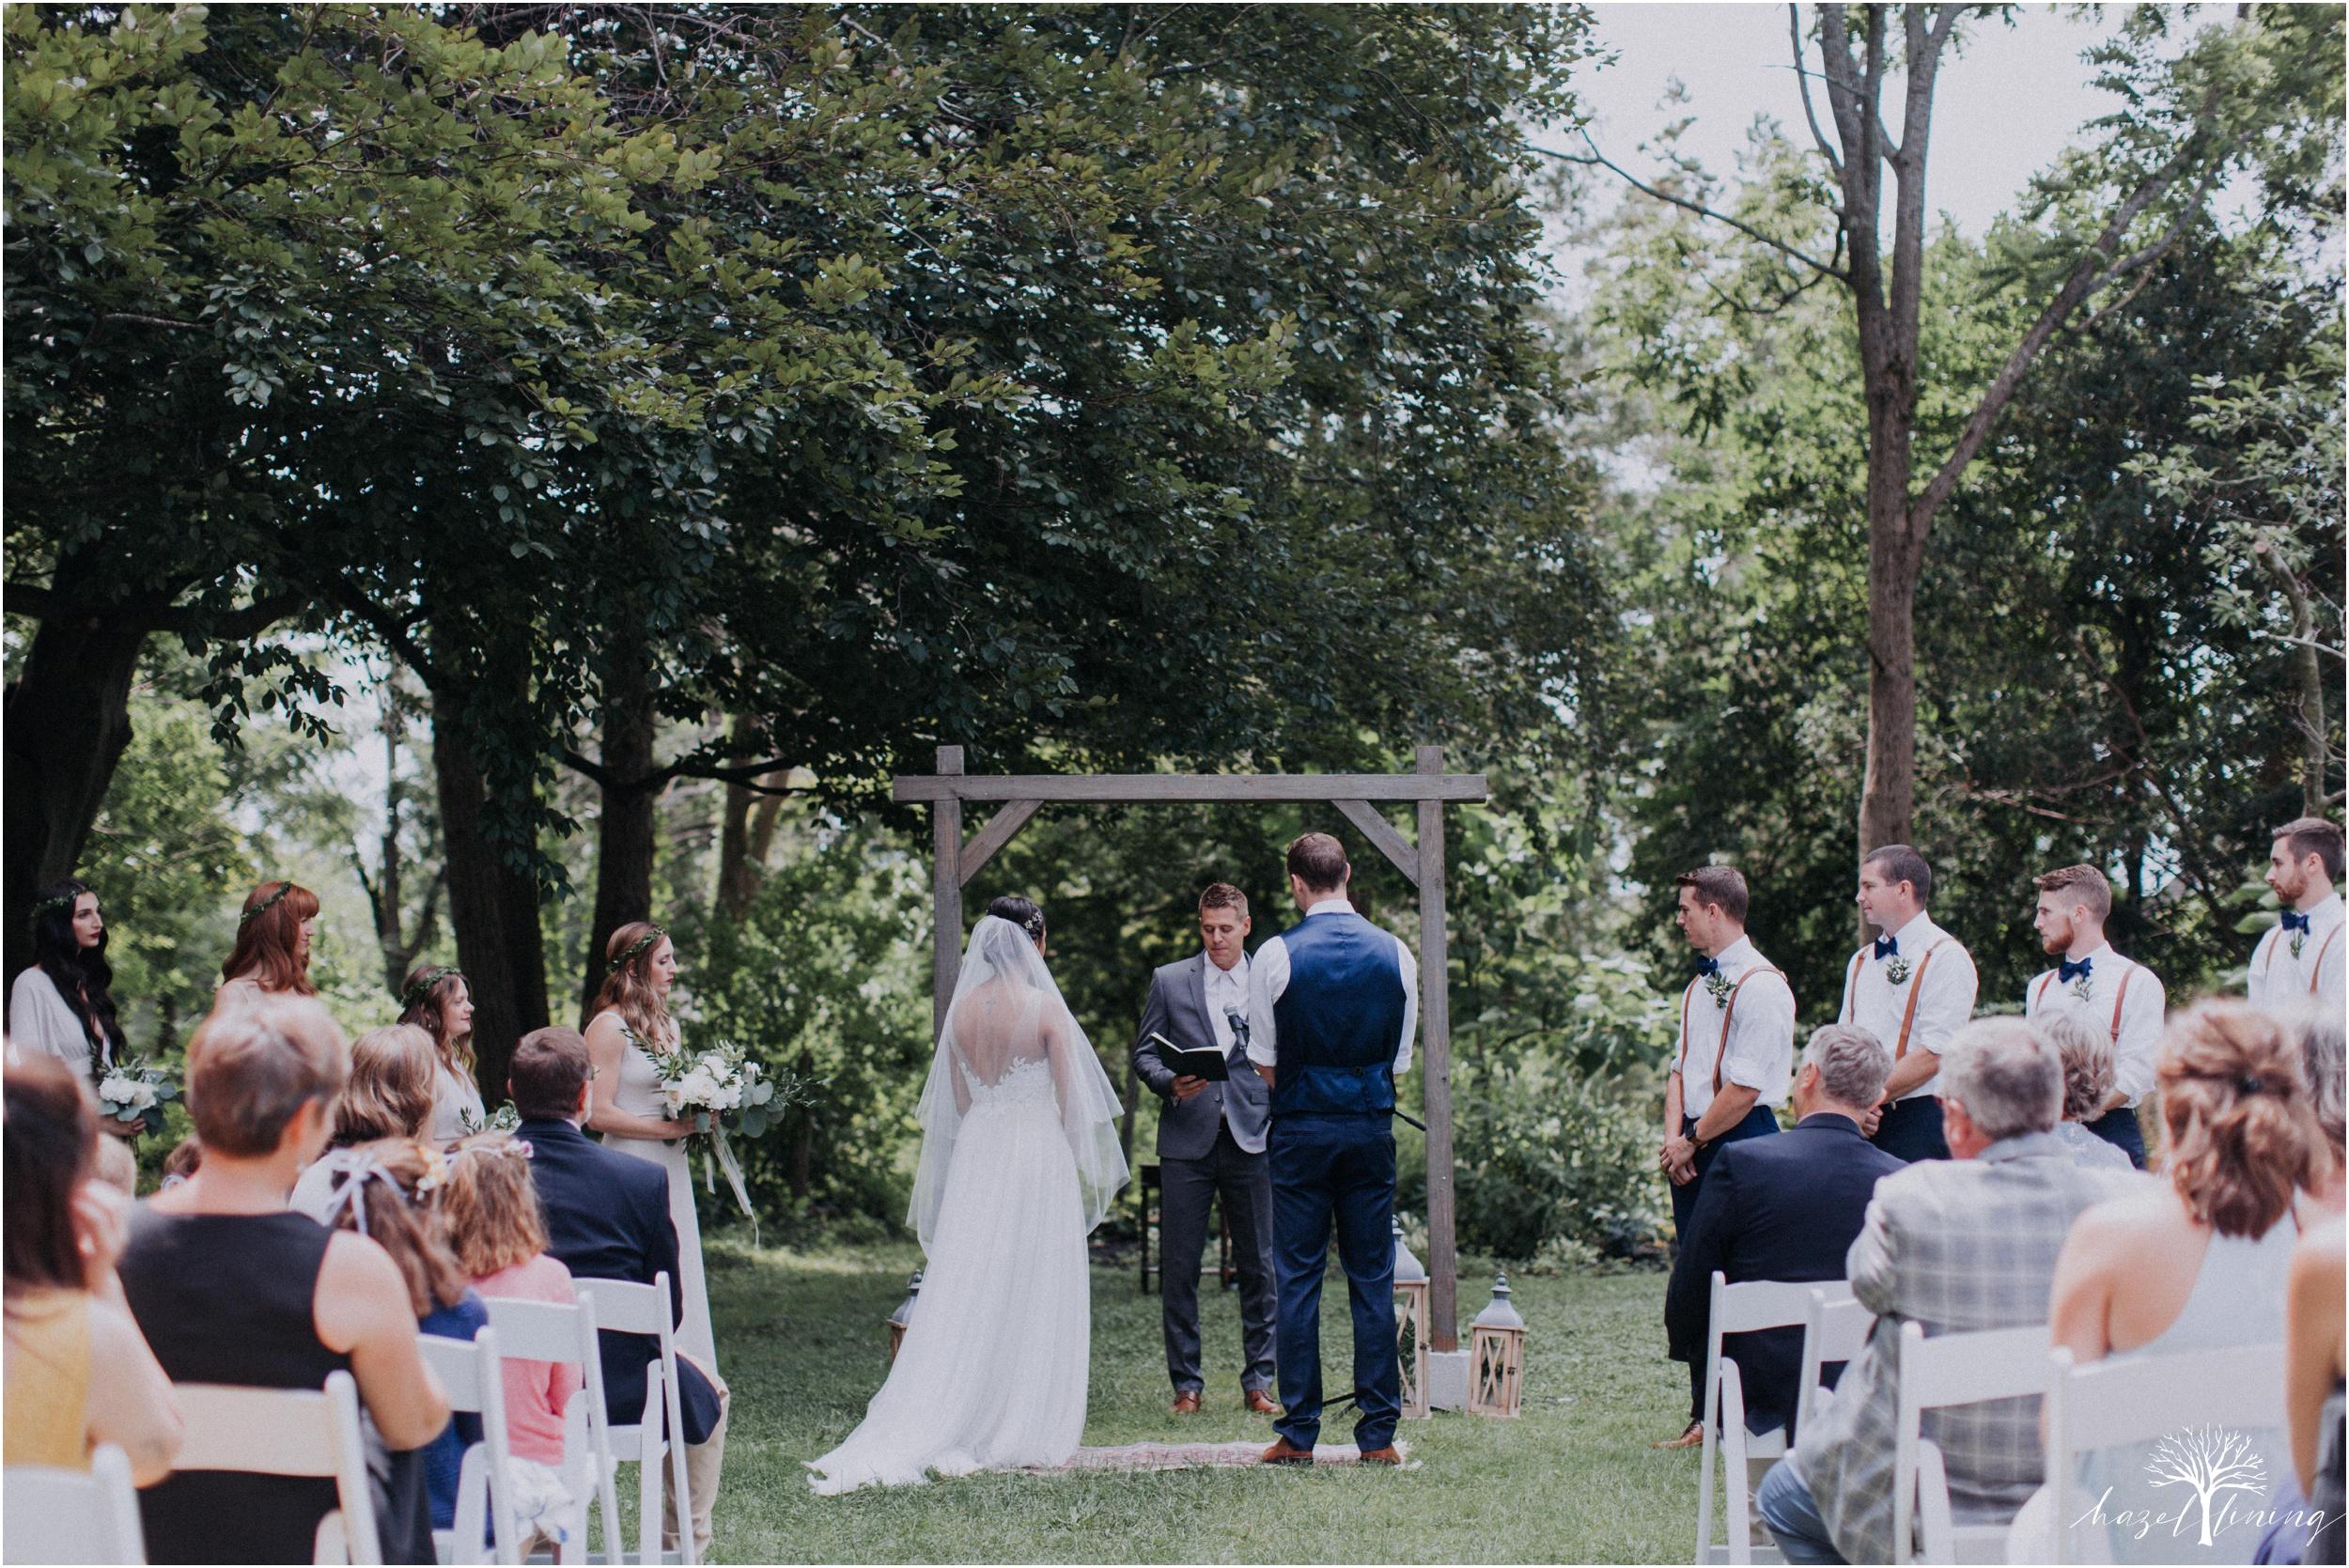 mariah-kreyling-samuel-sherratt-sherrattwiththeworld-peirce-farm-at-witch-hill-boston-massachusetts-wedding-photography-hazel-lining-travel-wedding-elopement-photography_0082.jpg